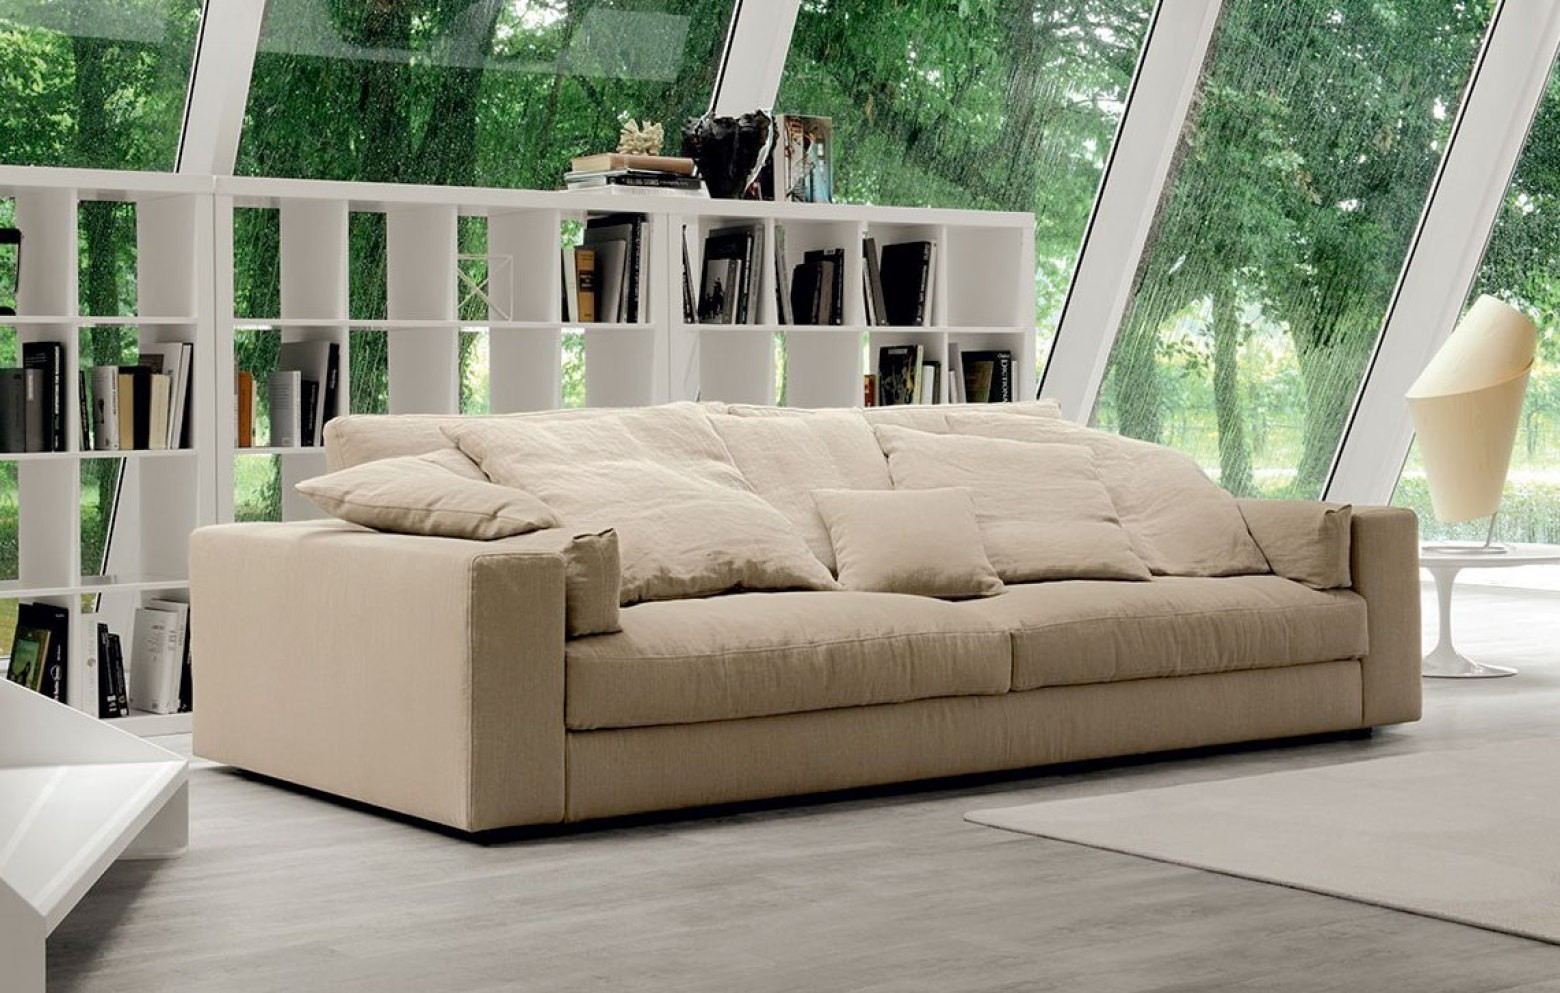 summer einzelsofas polsterm bel who 39 s perfect. Black Bedroom Furniture Sets. Home Design Ideas